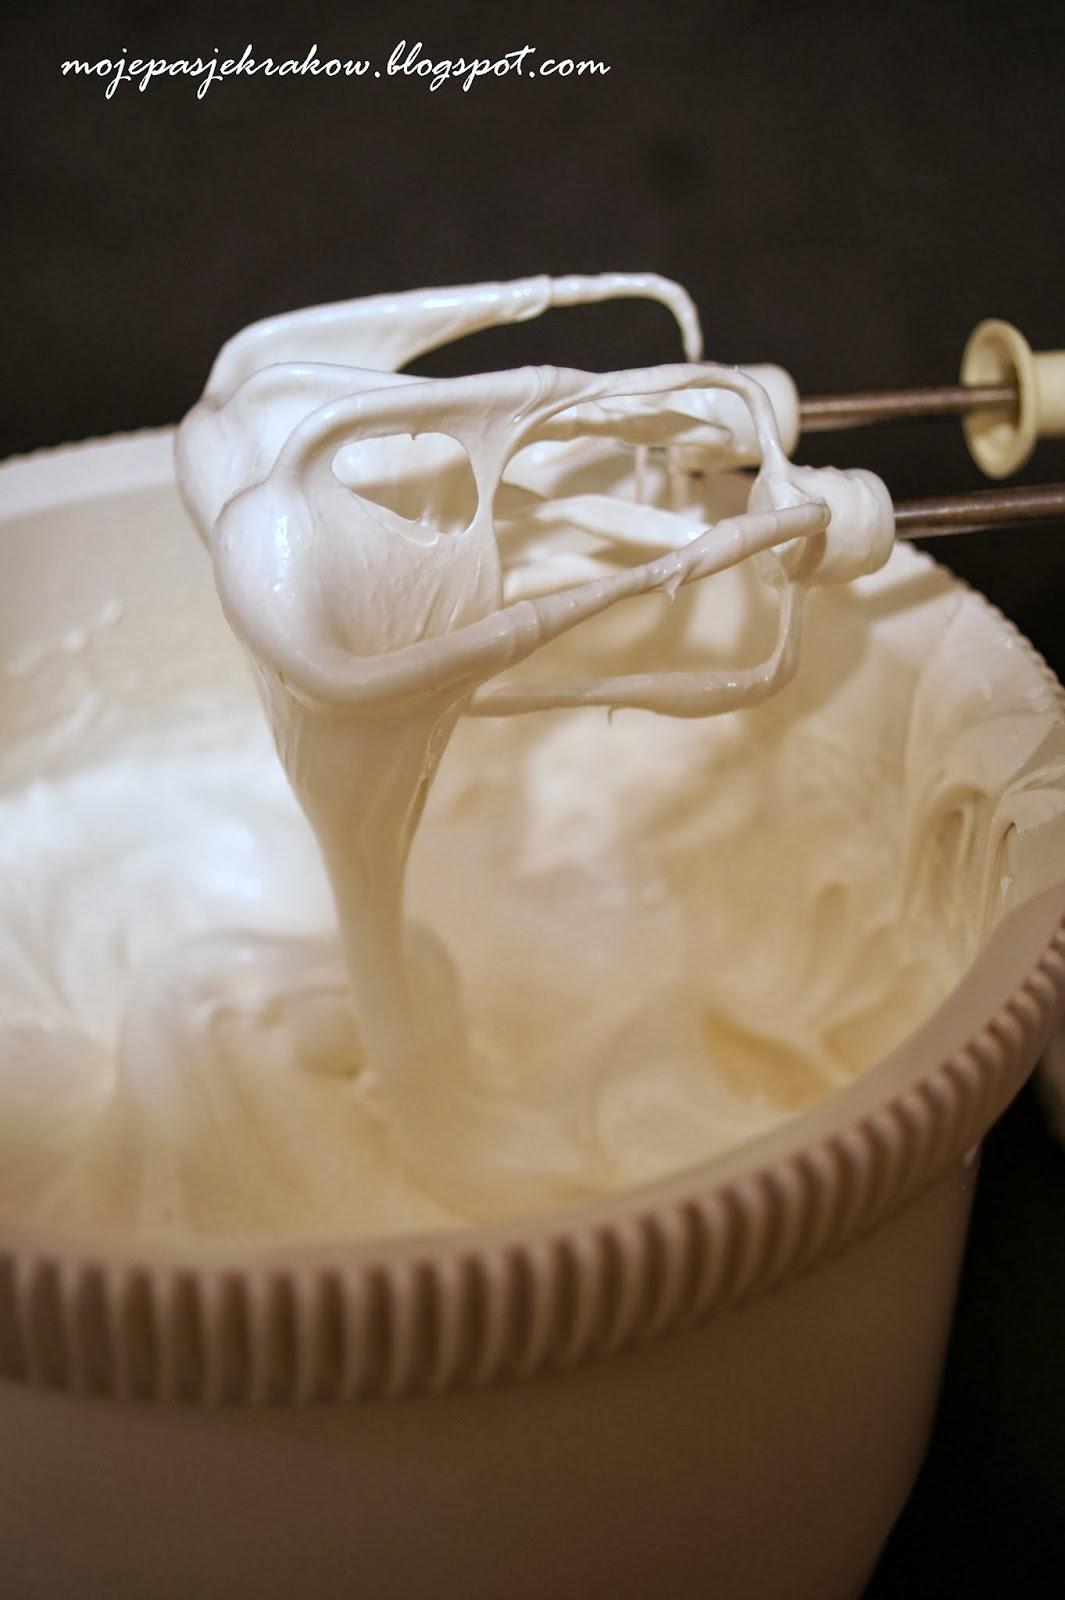 http://www.mojepasjekrakow.blogspot.com/2014/01/domowa-masa-marshmallow.html